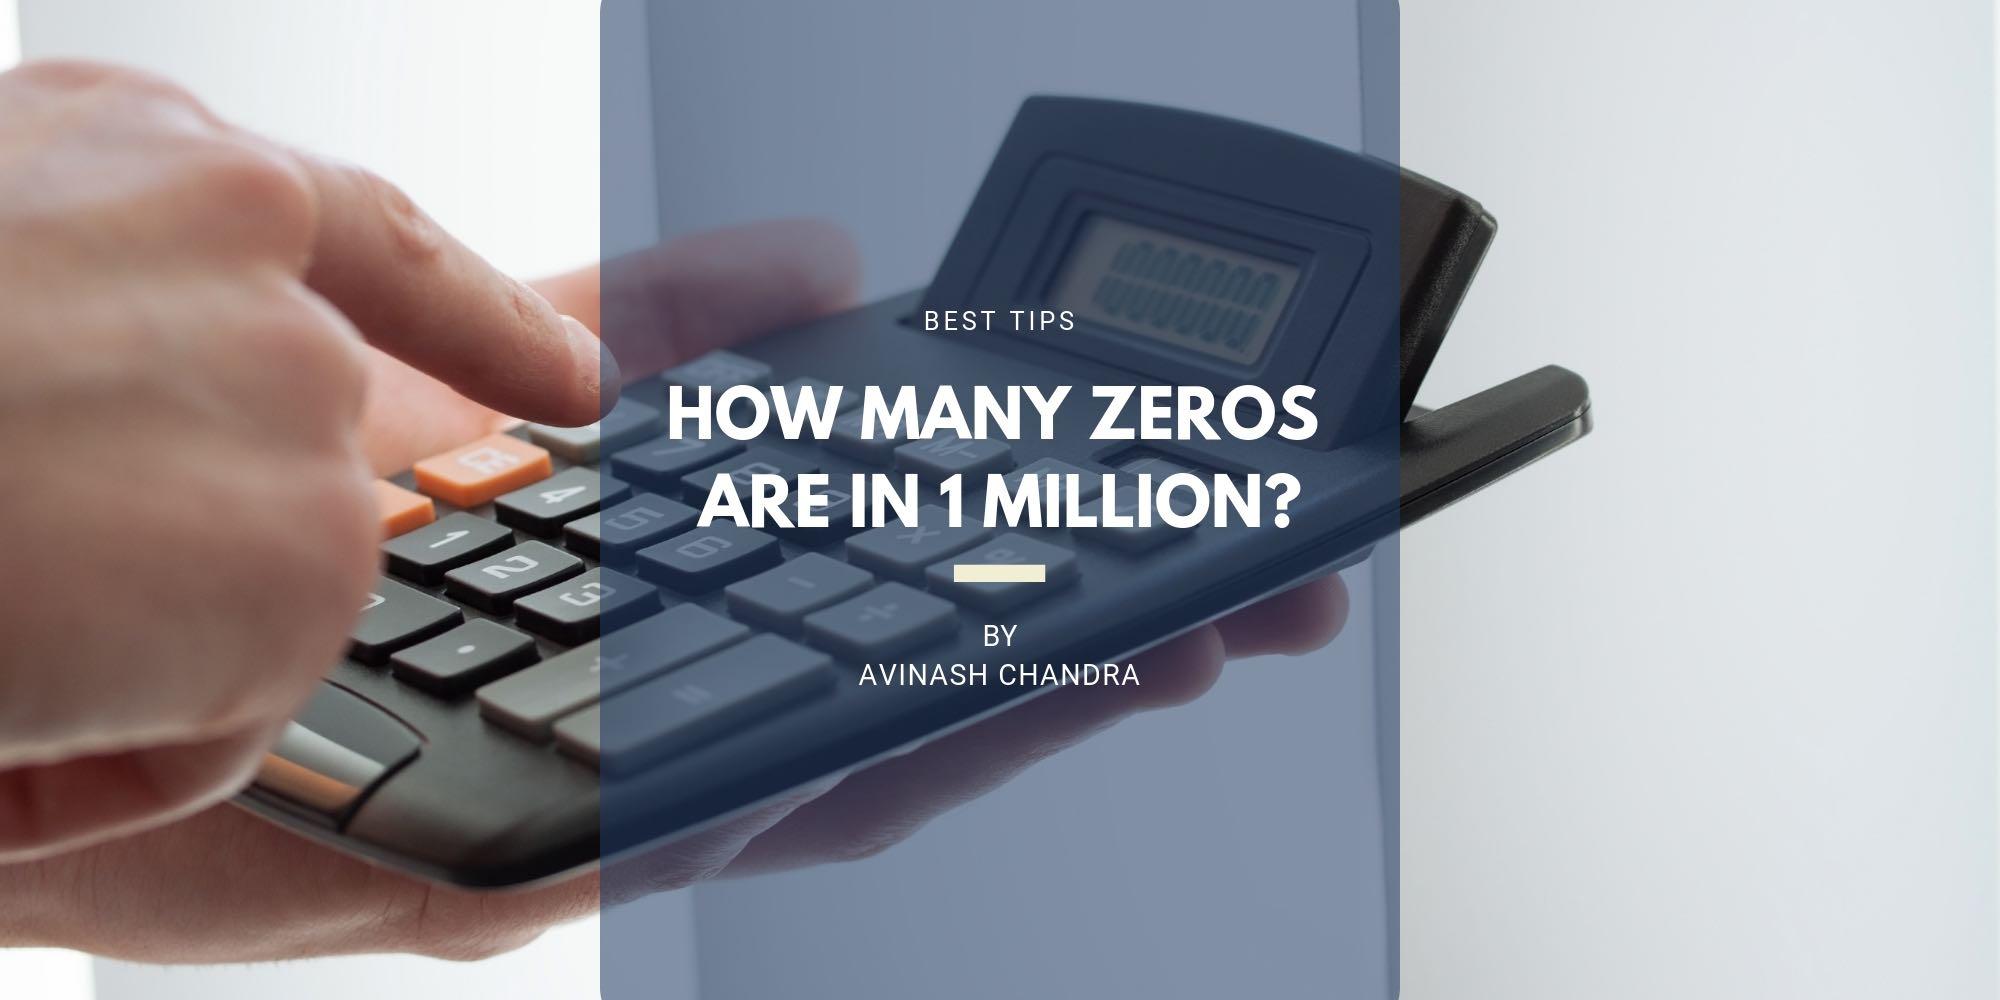 How Many Zeros In A Million How Many Zeros In 1 Million